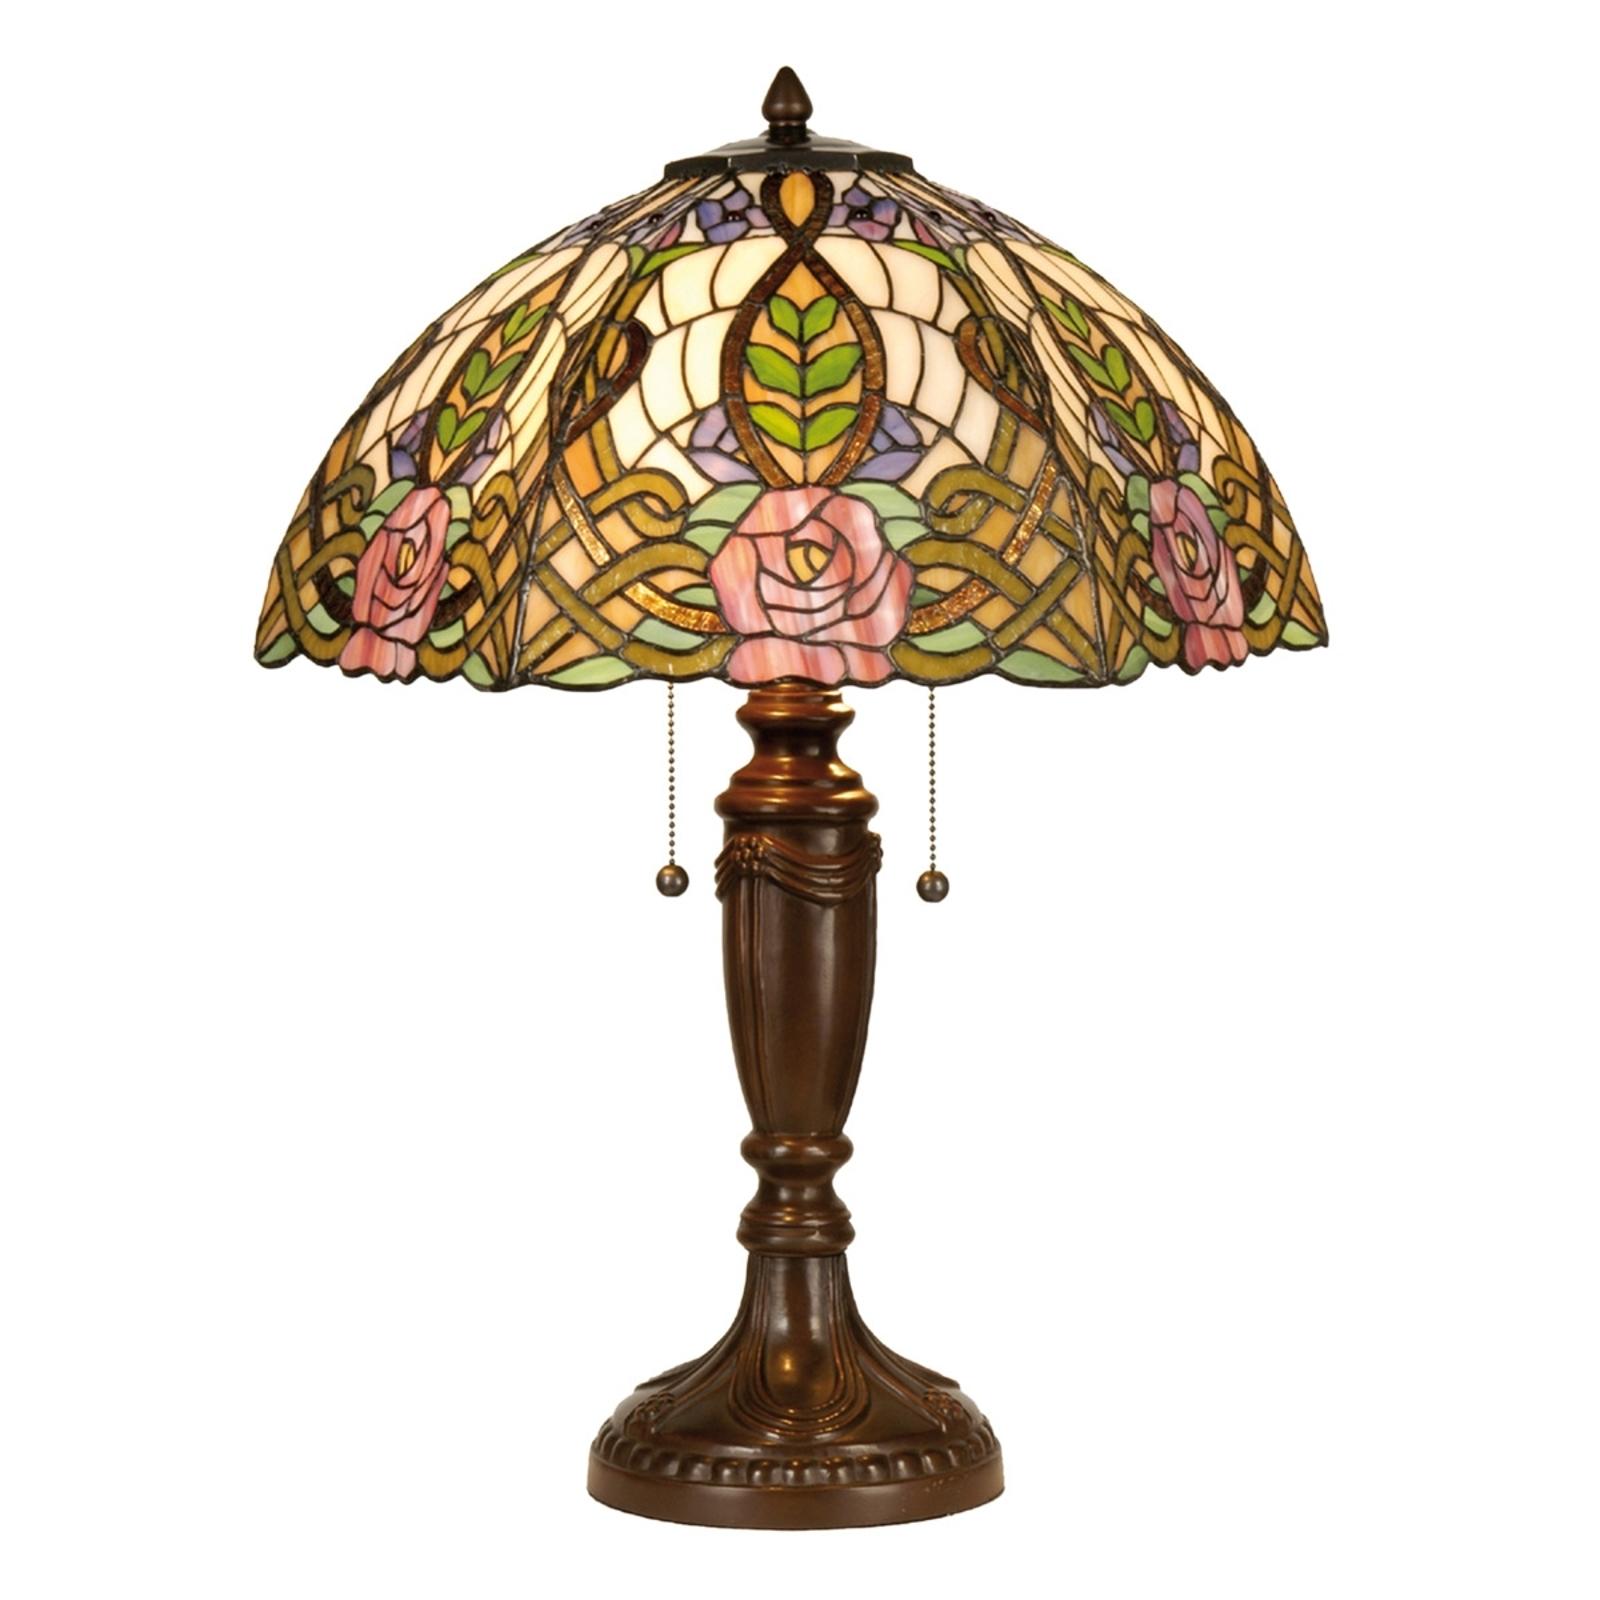 Paradijselijke tafellamp Eden in Tiffany-stijl